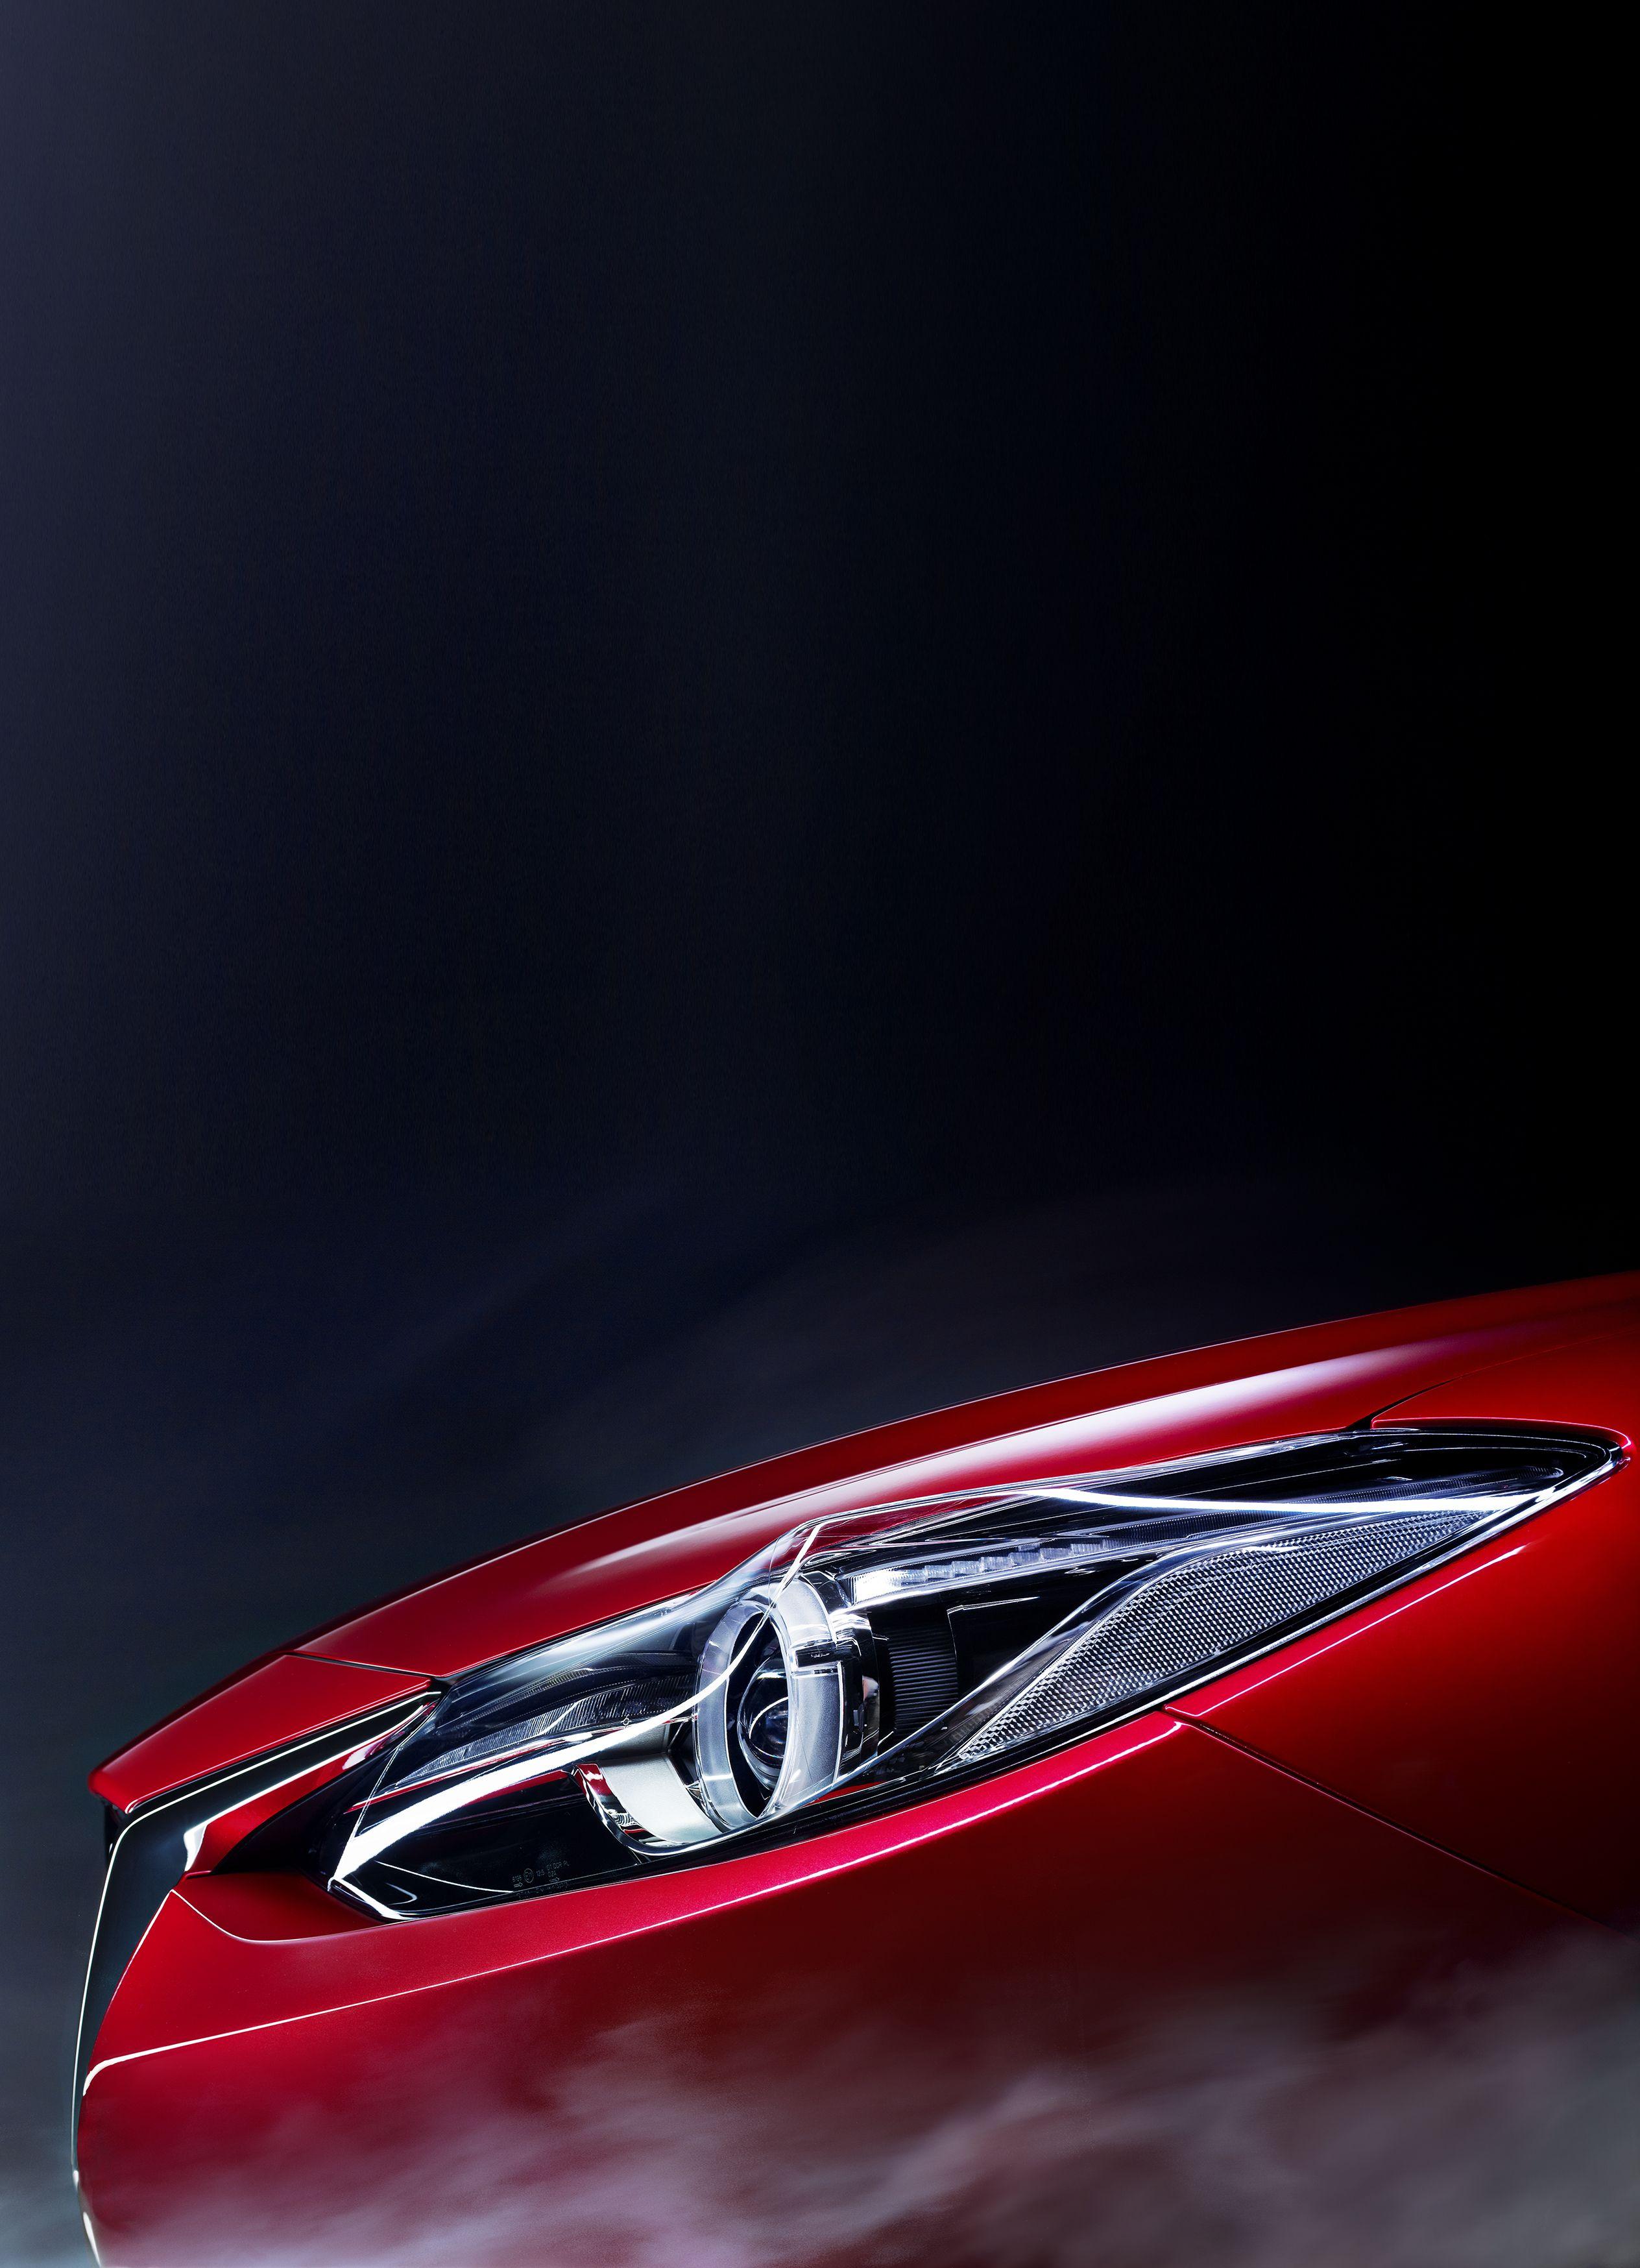 Pin by Flanagan Motors Mazda and Used Cars on Mazda Around the World